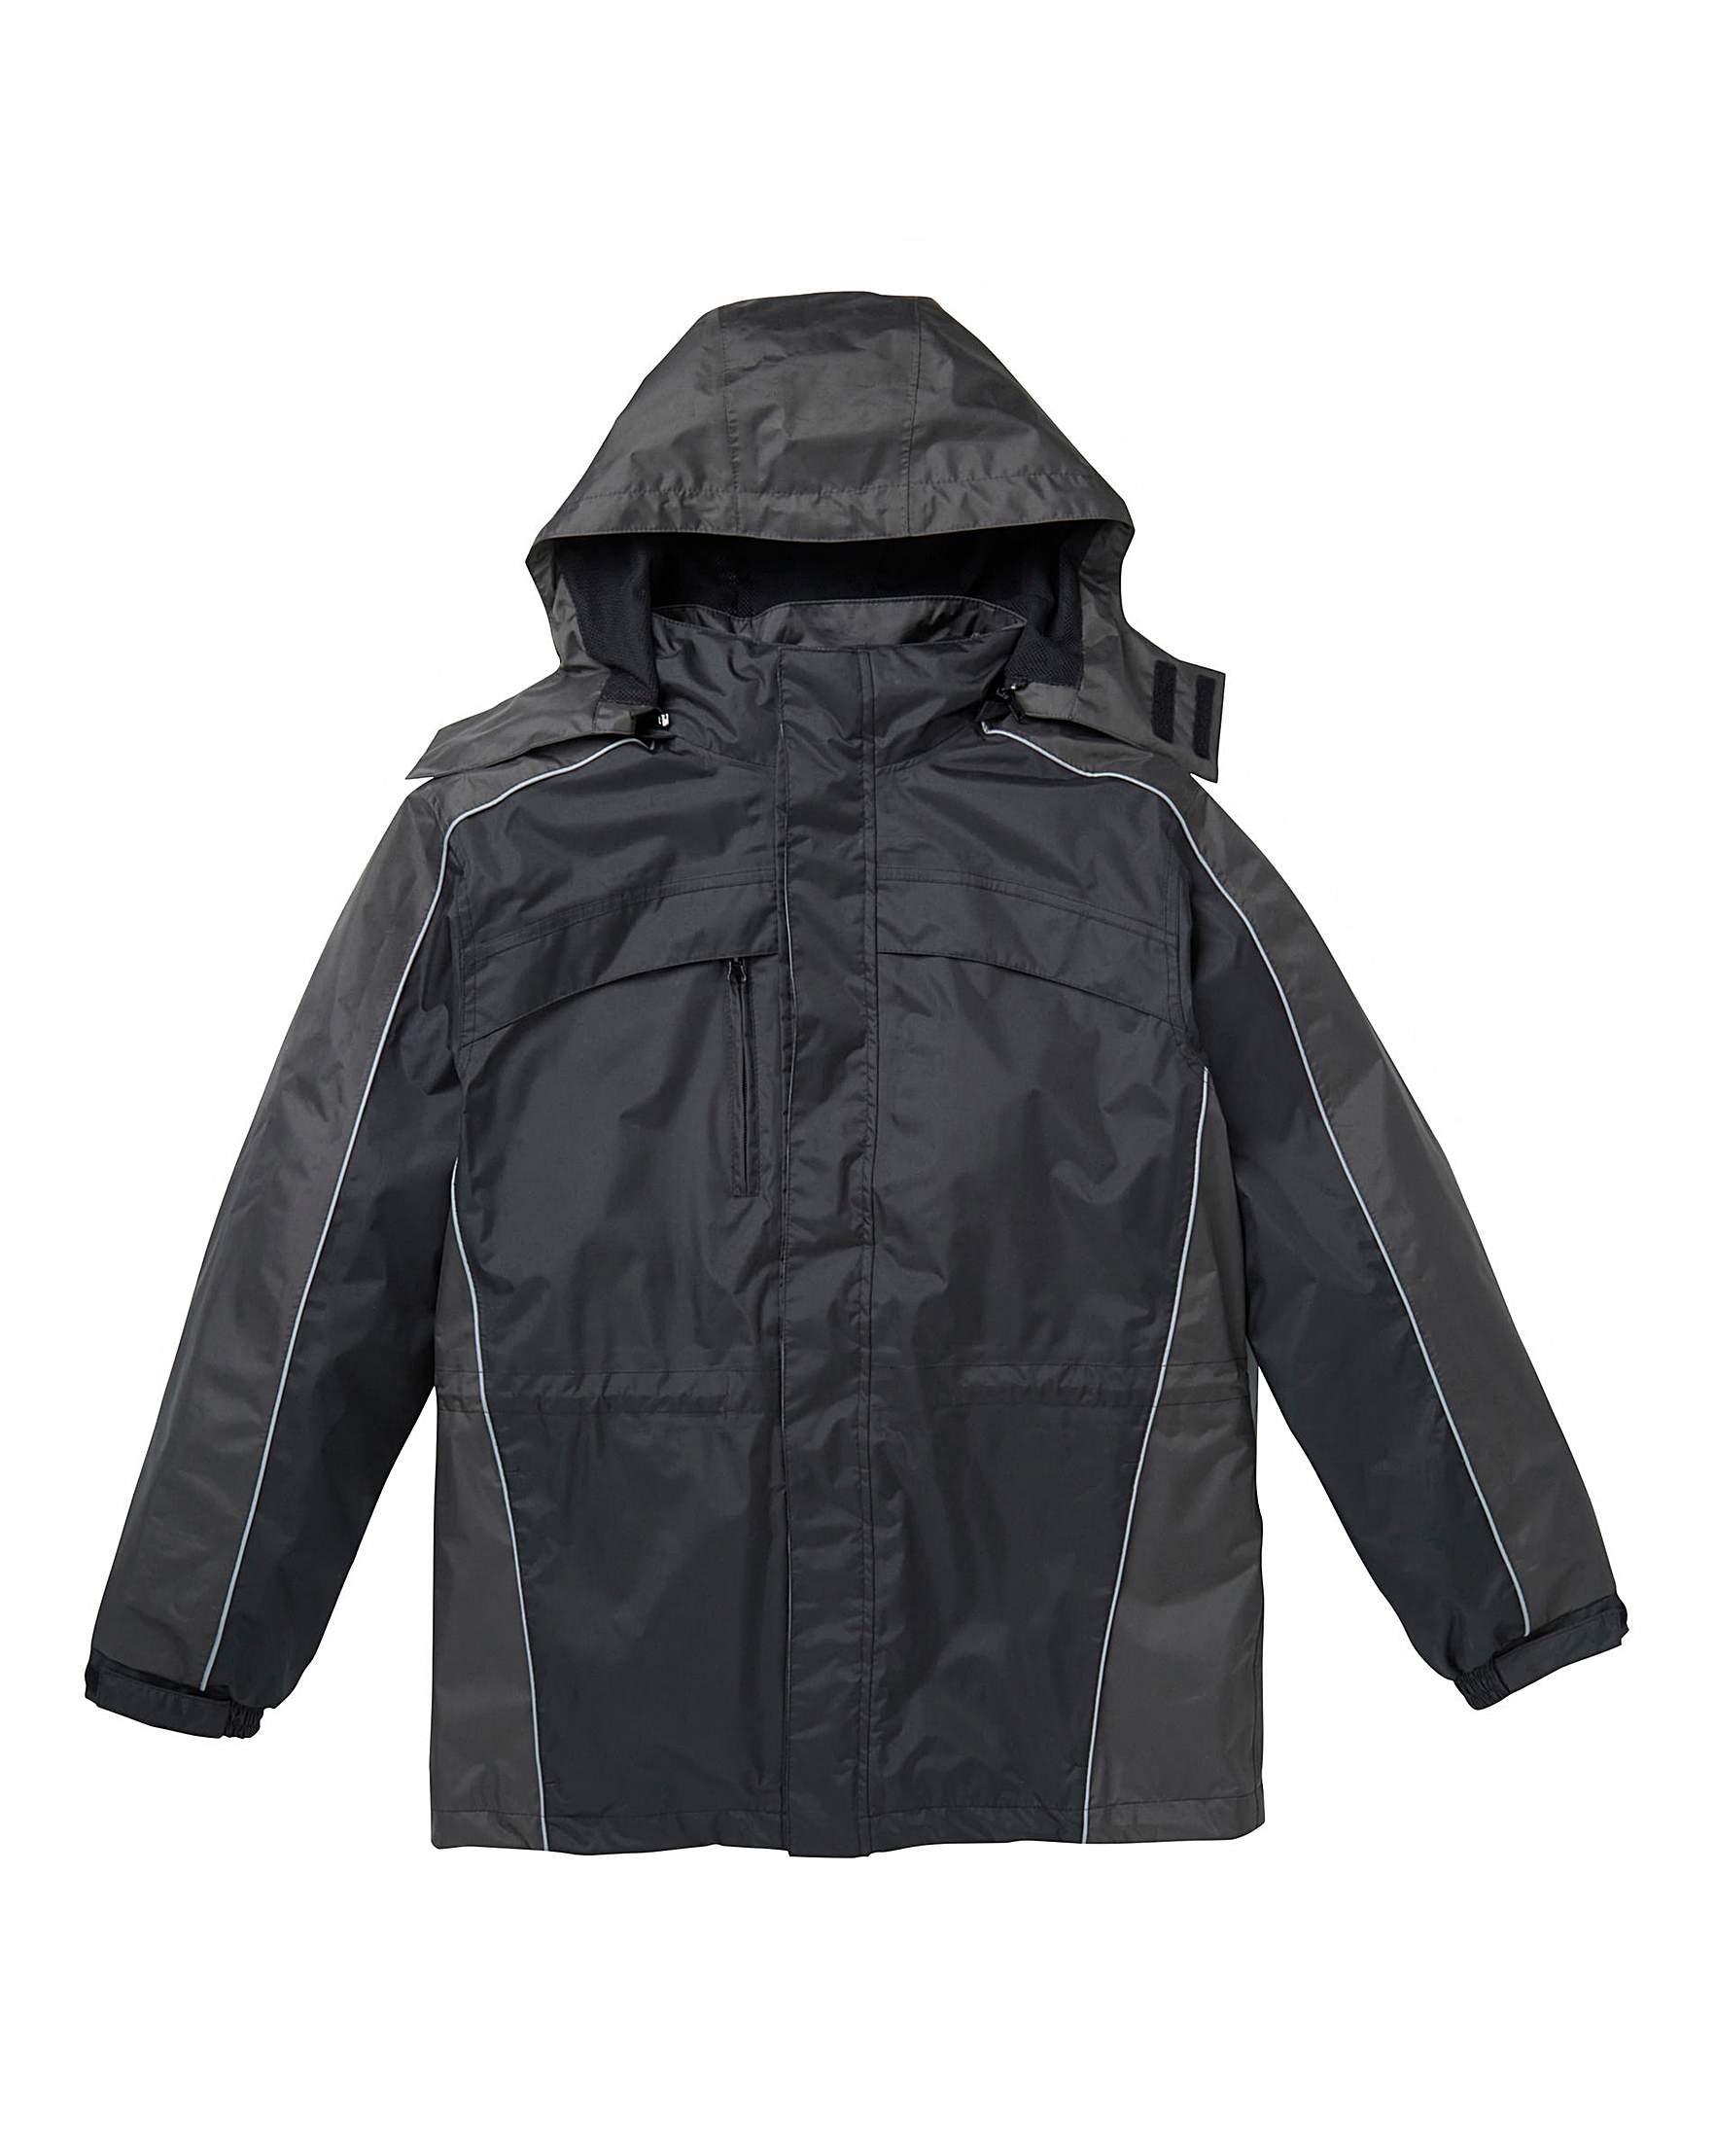 b8166d9f211 Premier Man Black 3 in 1 Jacket Regular